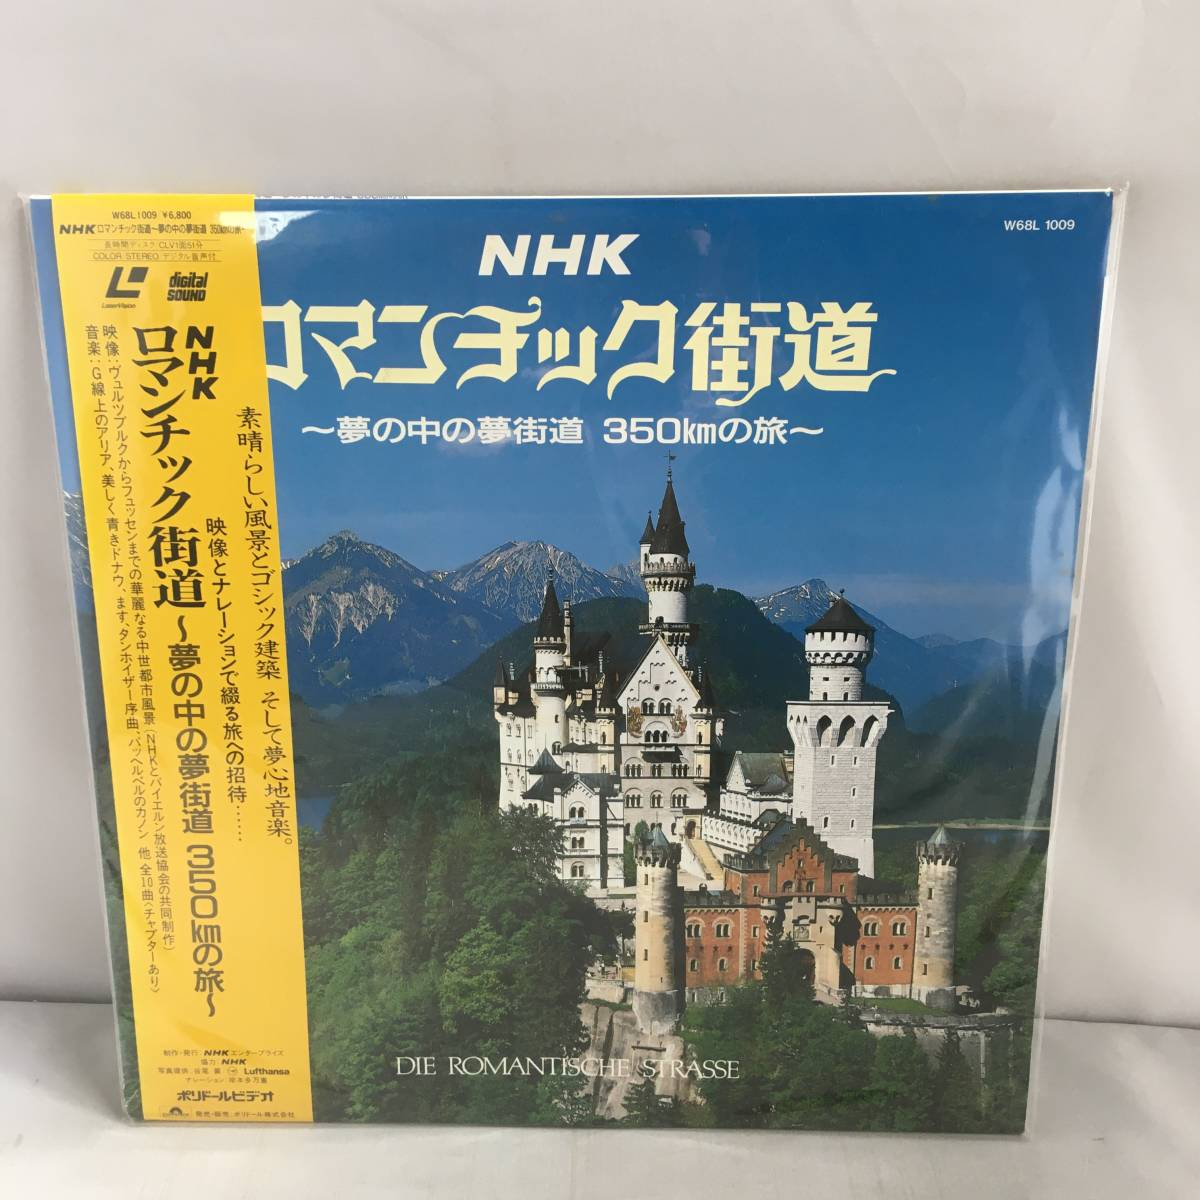 L2009 dream Road Gothic architecture in the LD · laser disk NHK Romantic Road dream